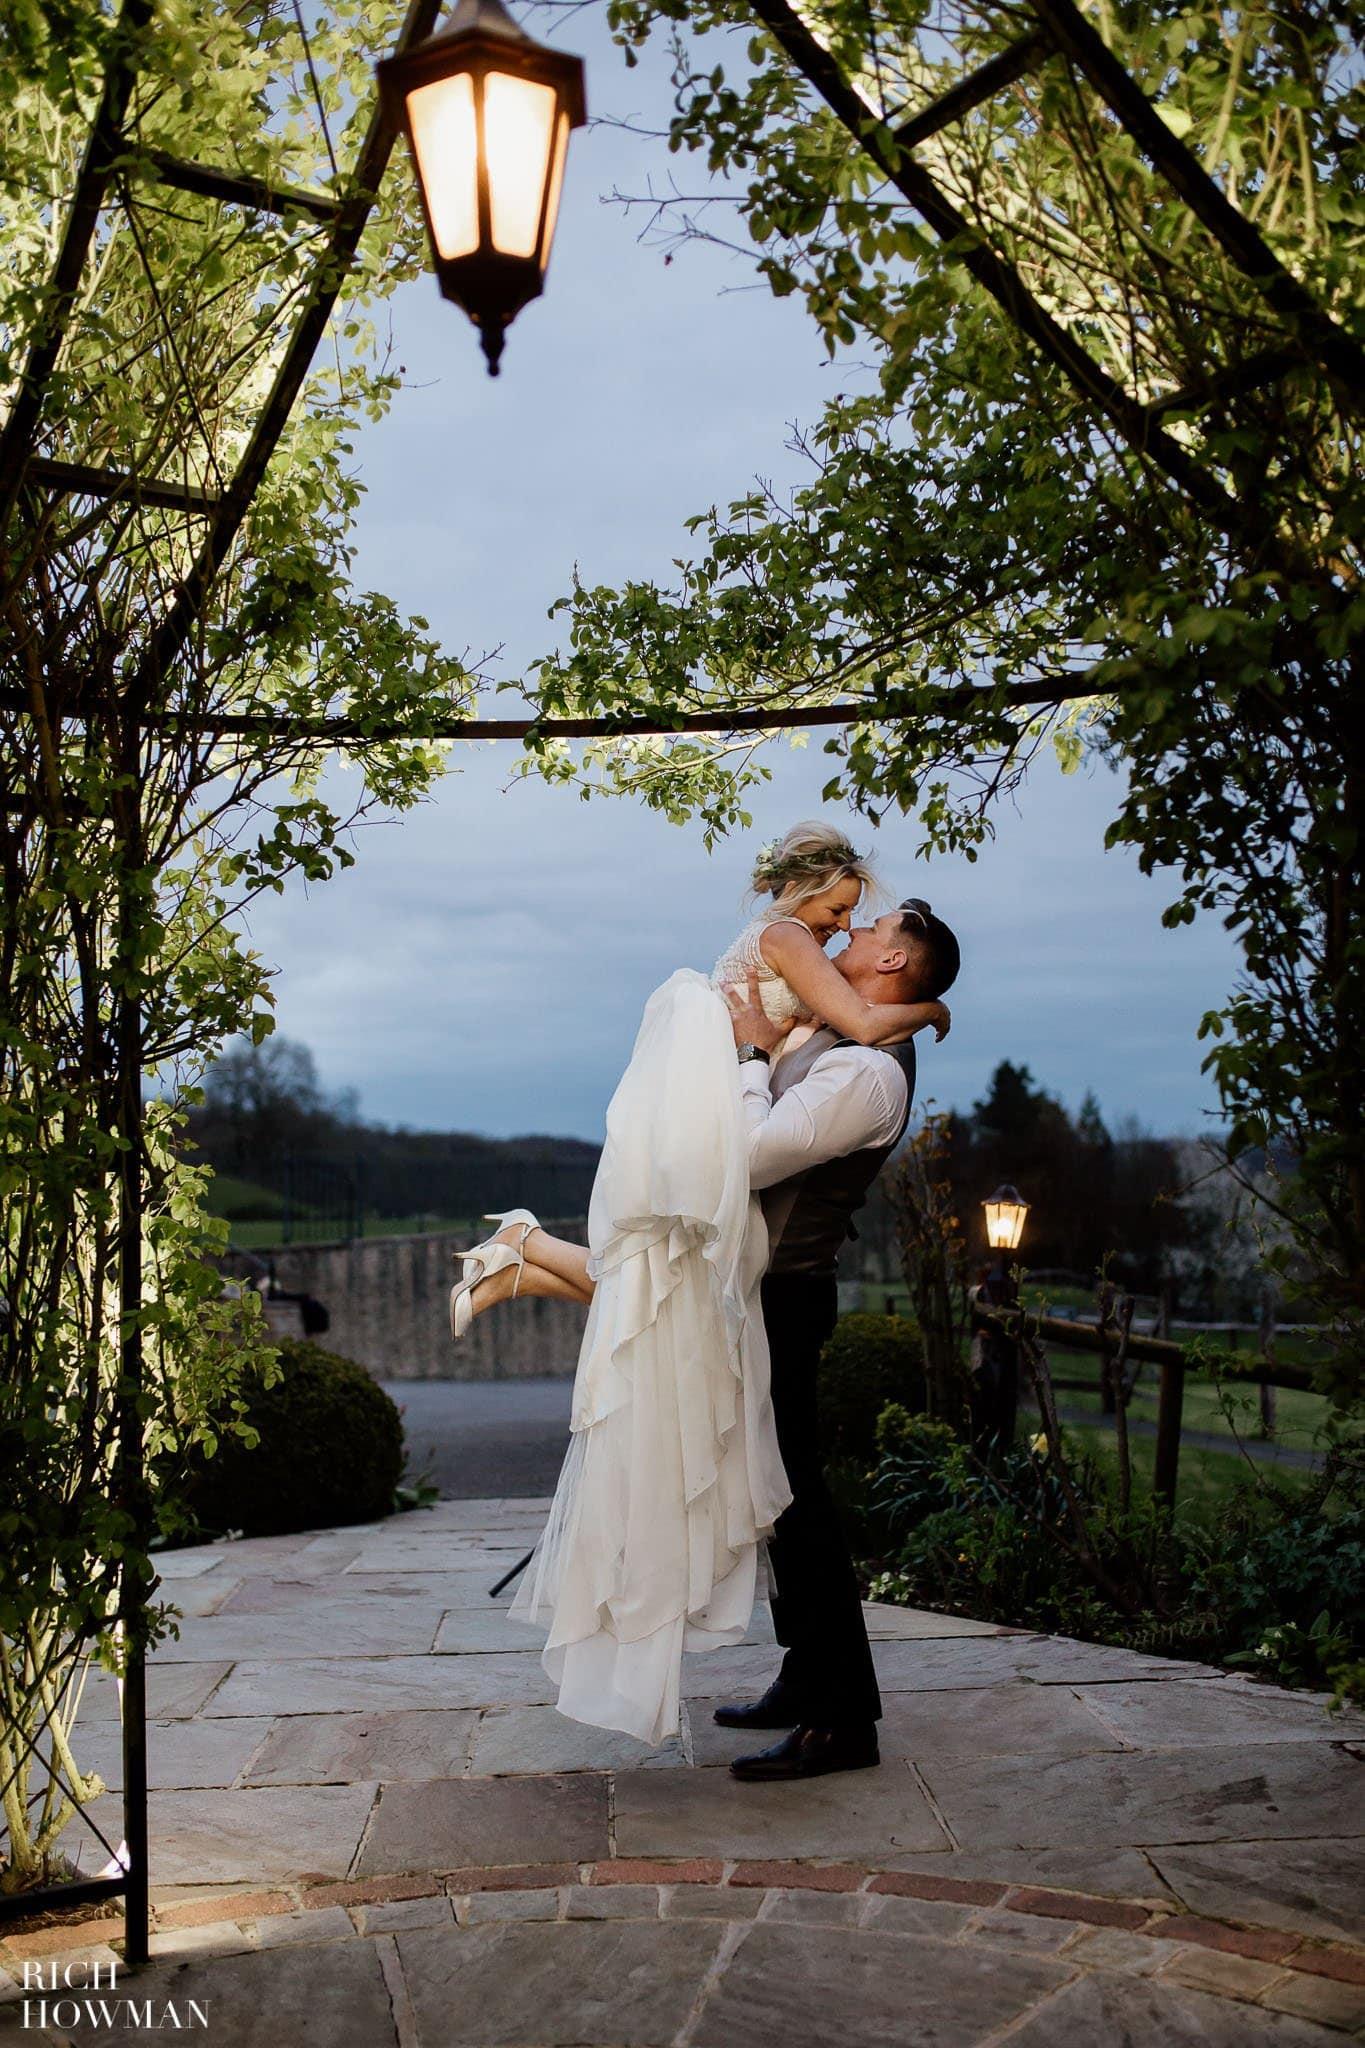 Kingscote Barn Wedding Photographer 64